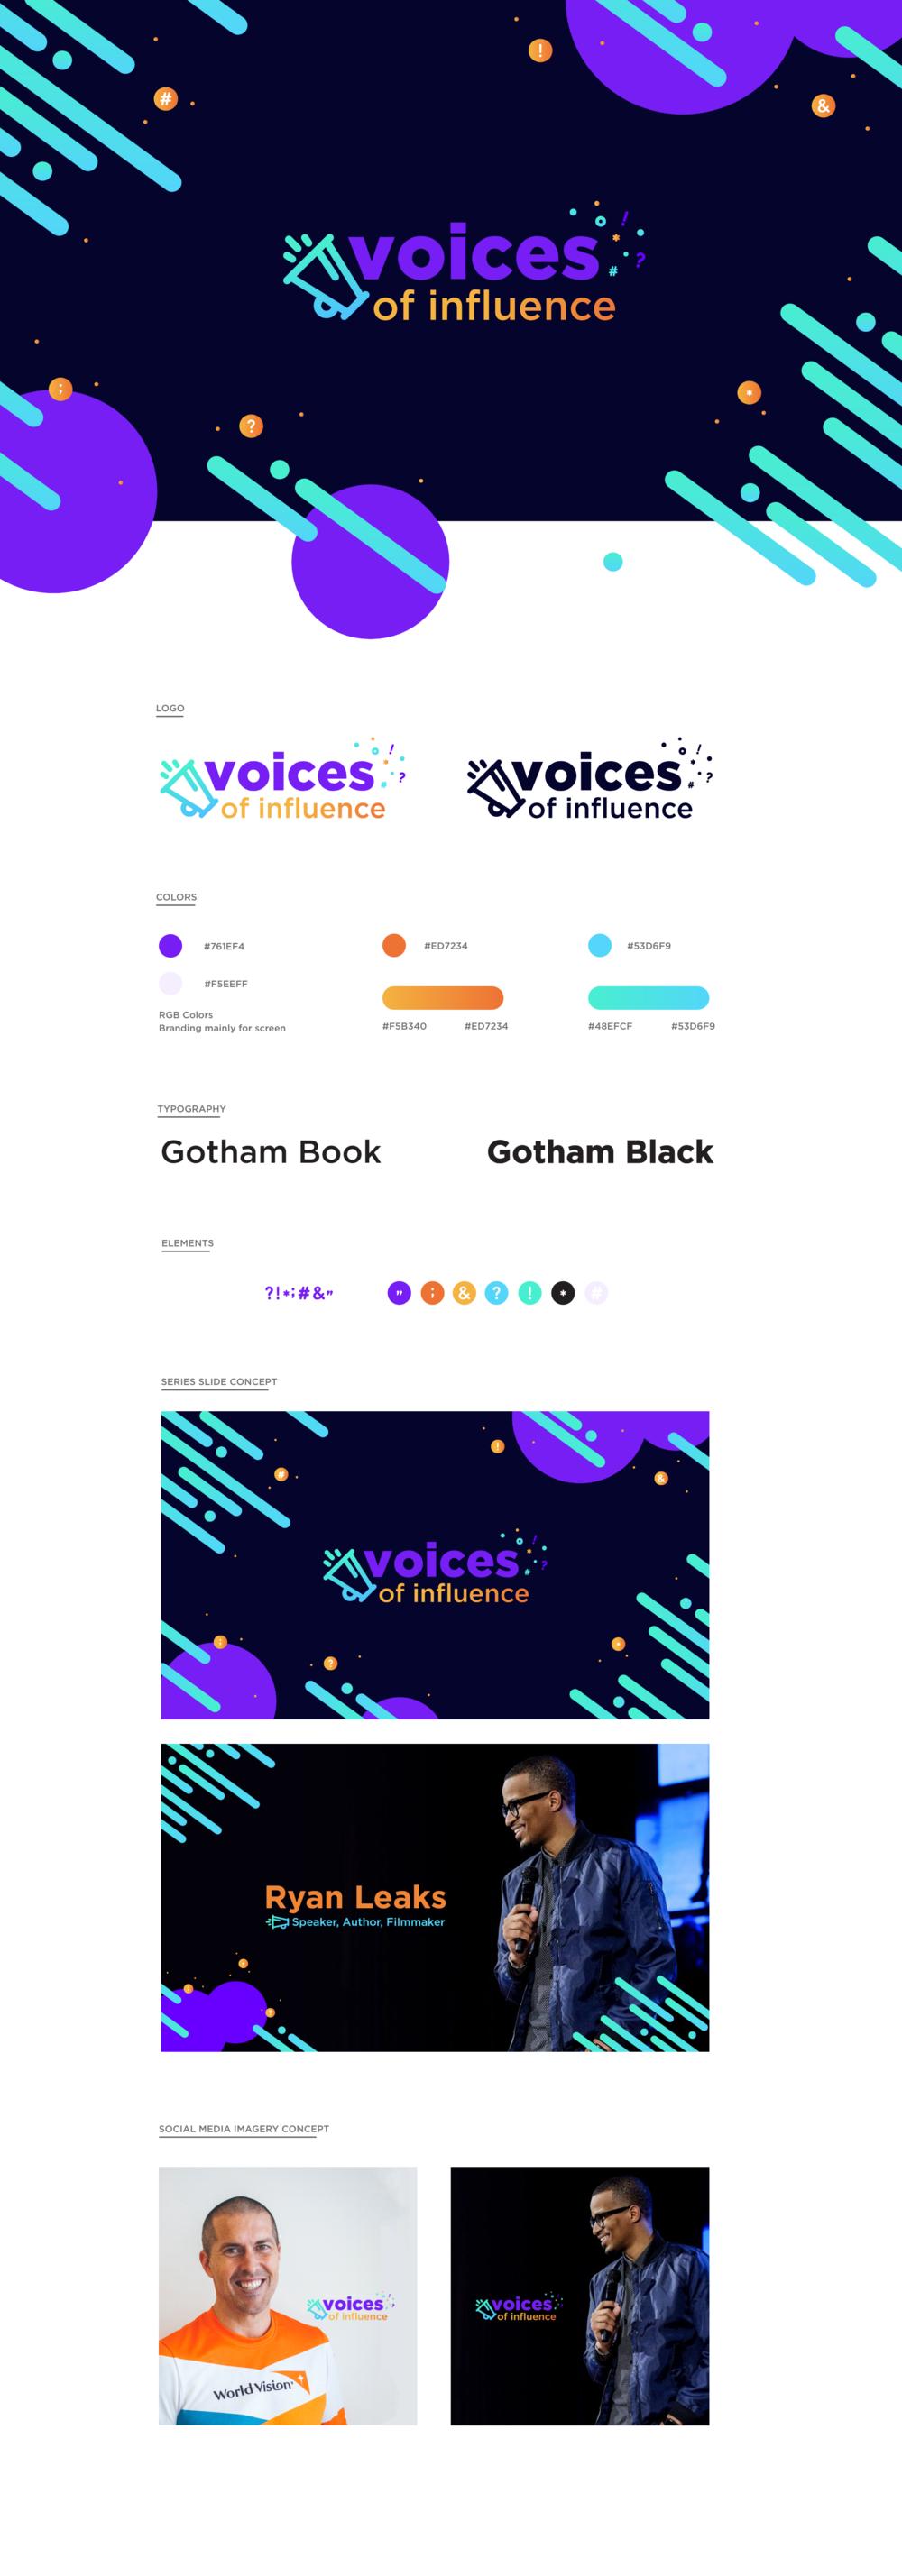 VoicesofInfluence-SermonSeries-Branding2.png